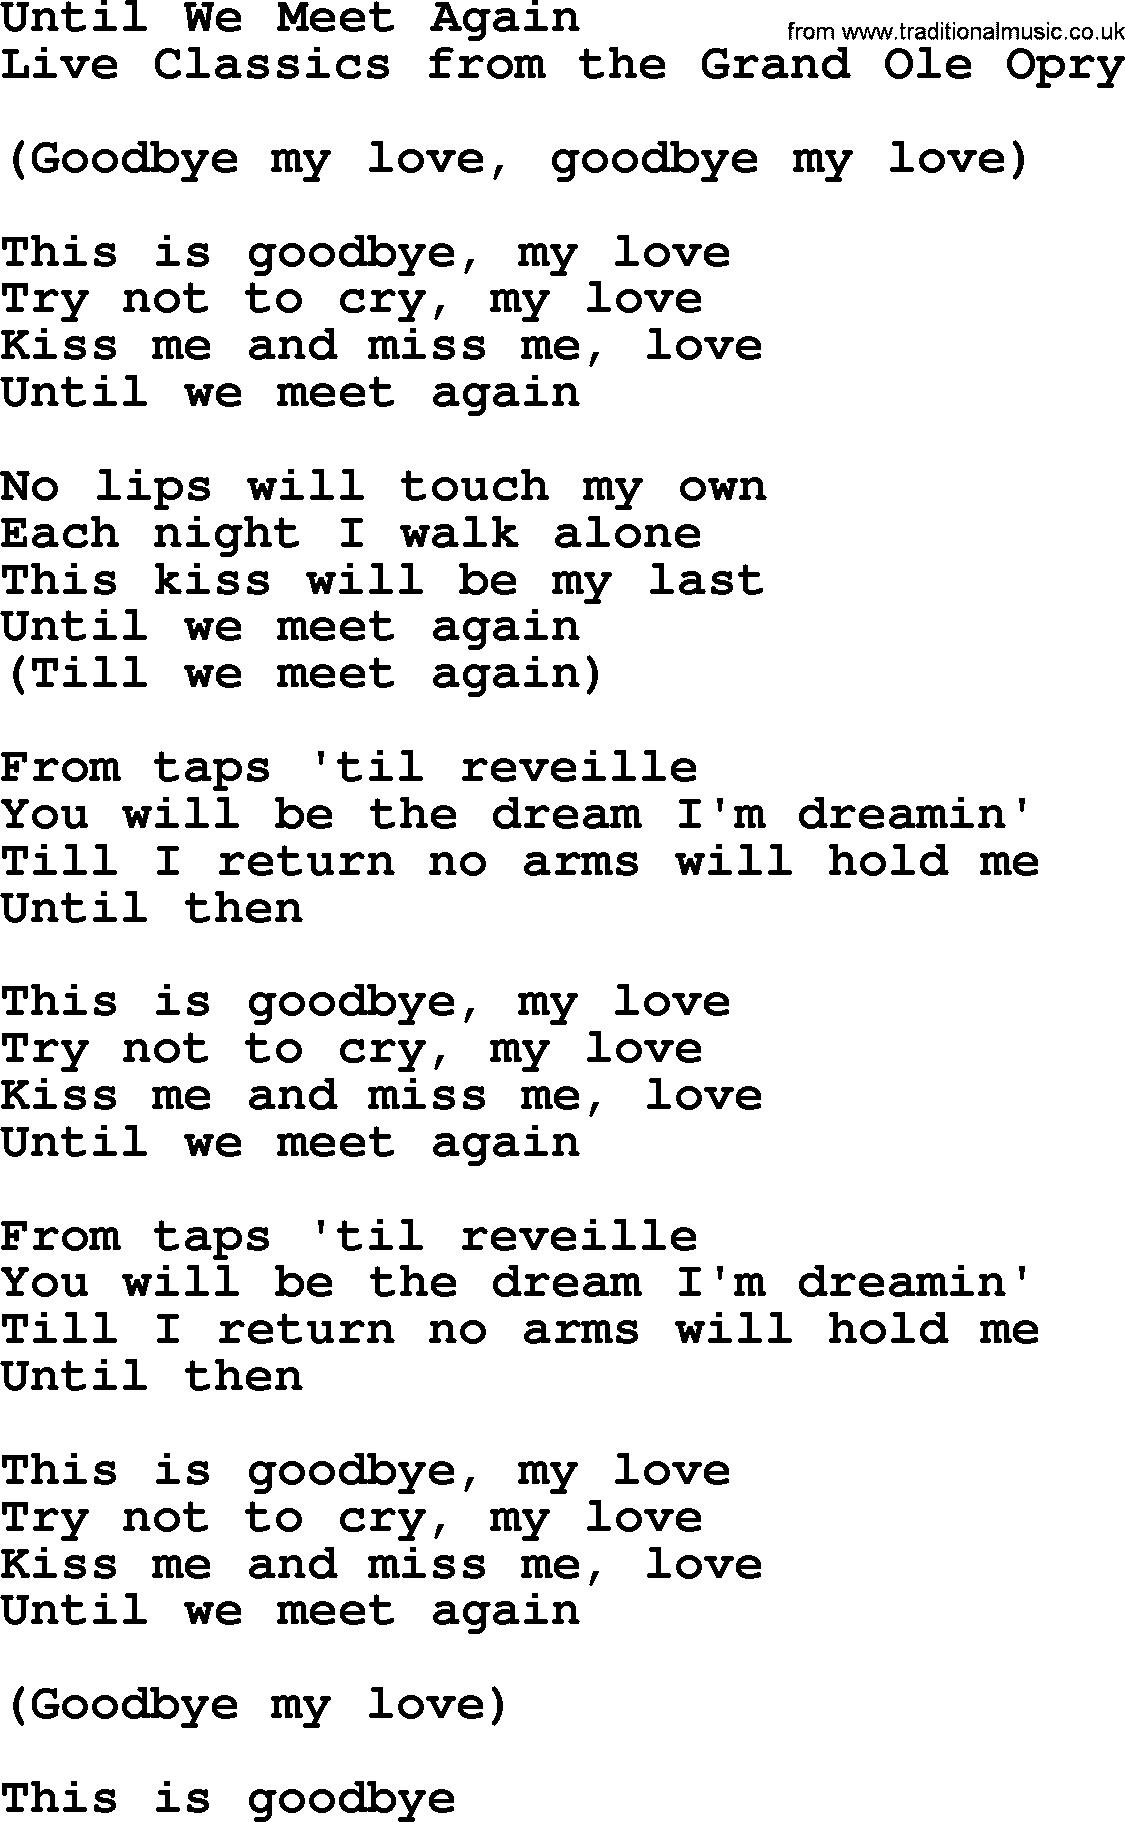 till the day we meet again chords